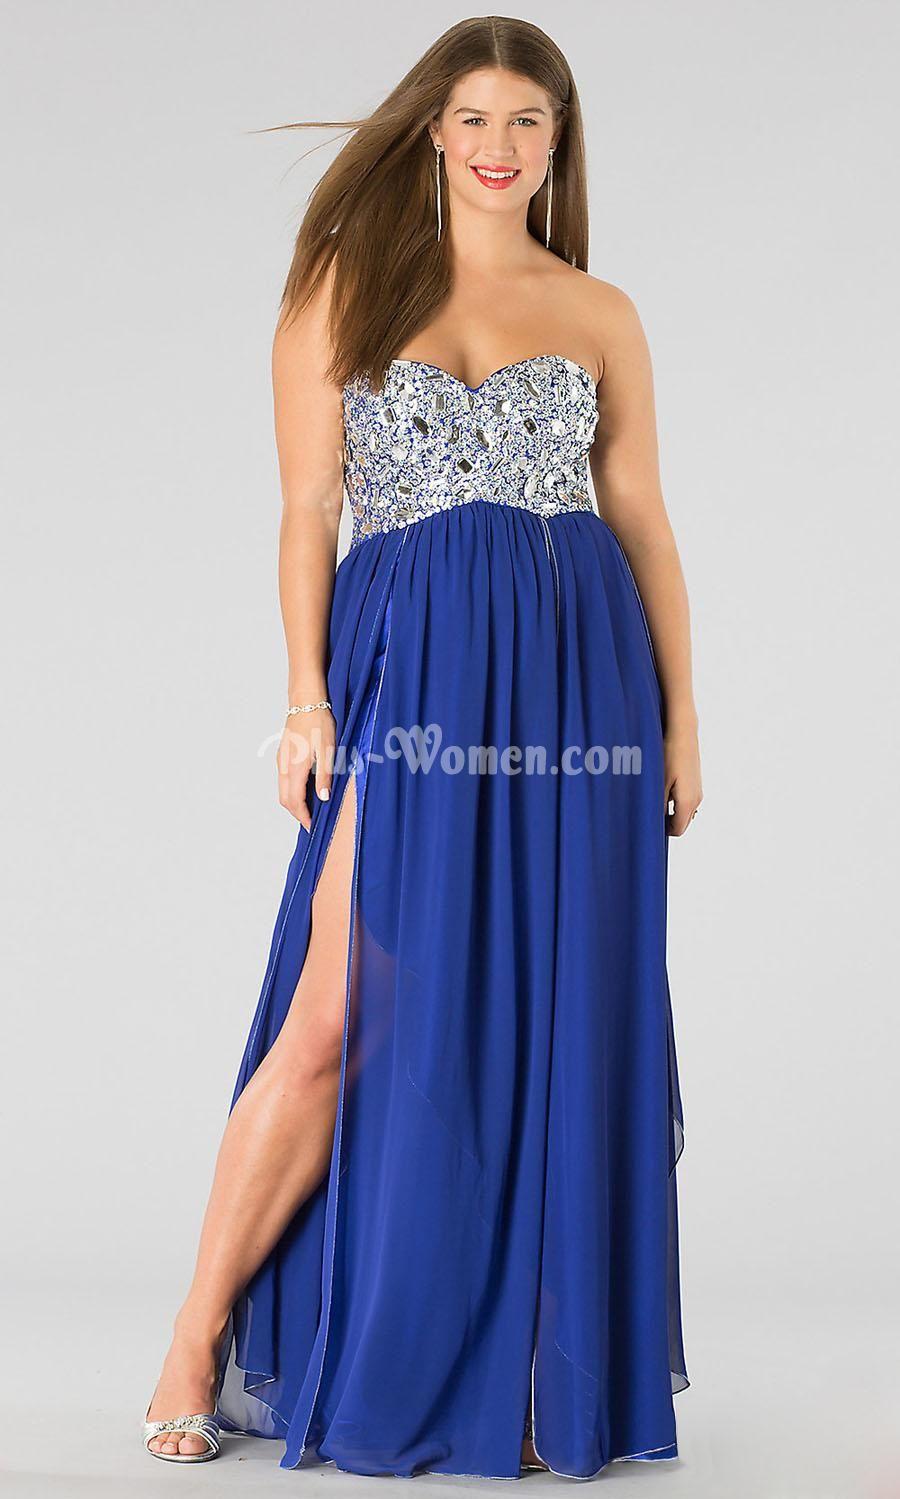 Strapless sweetheart royal blue chiffon slit long plus size prom